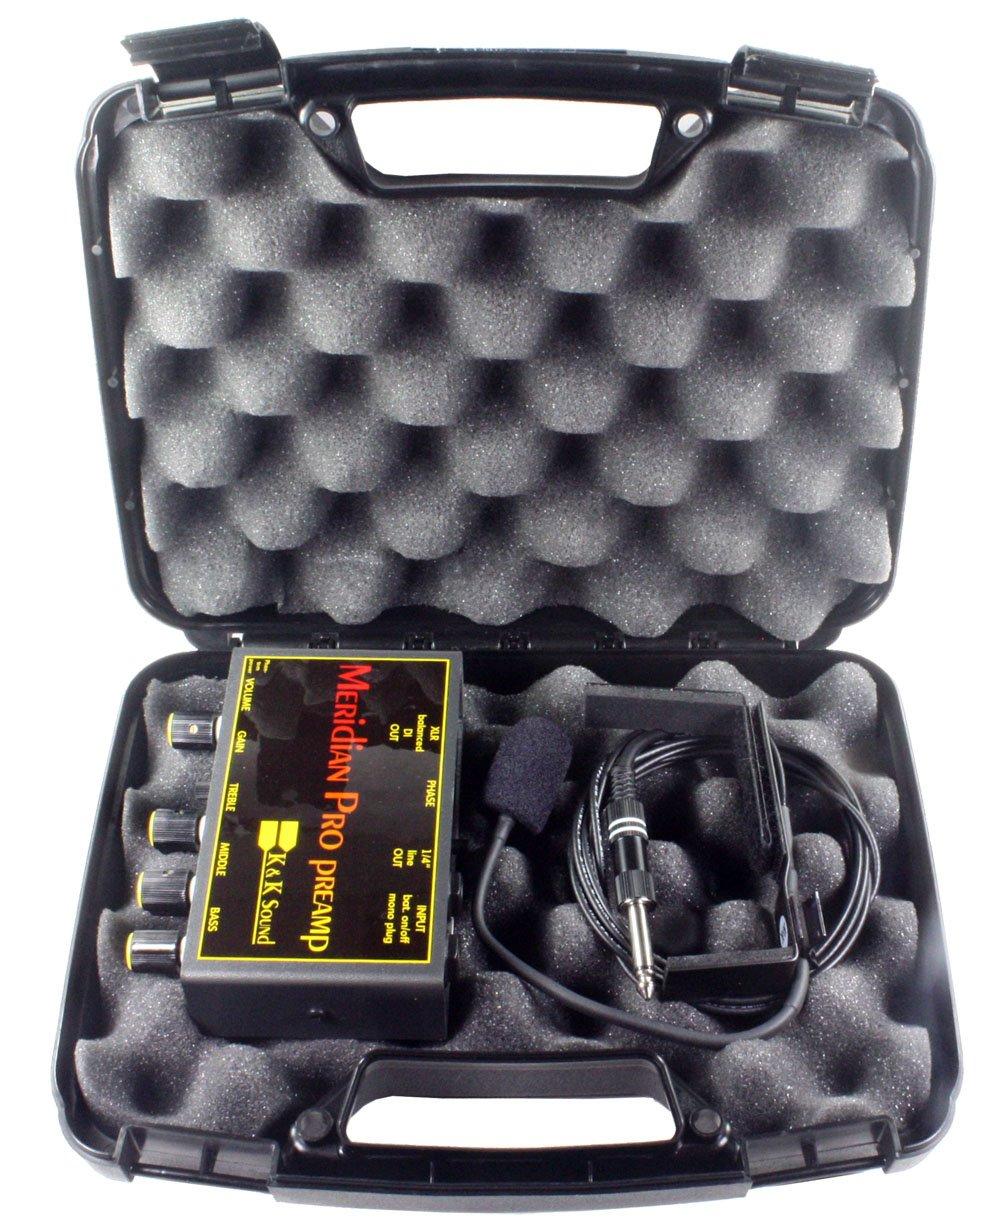 K&K Sound Meridian PRO External Guitar Microphone System w/Preamp